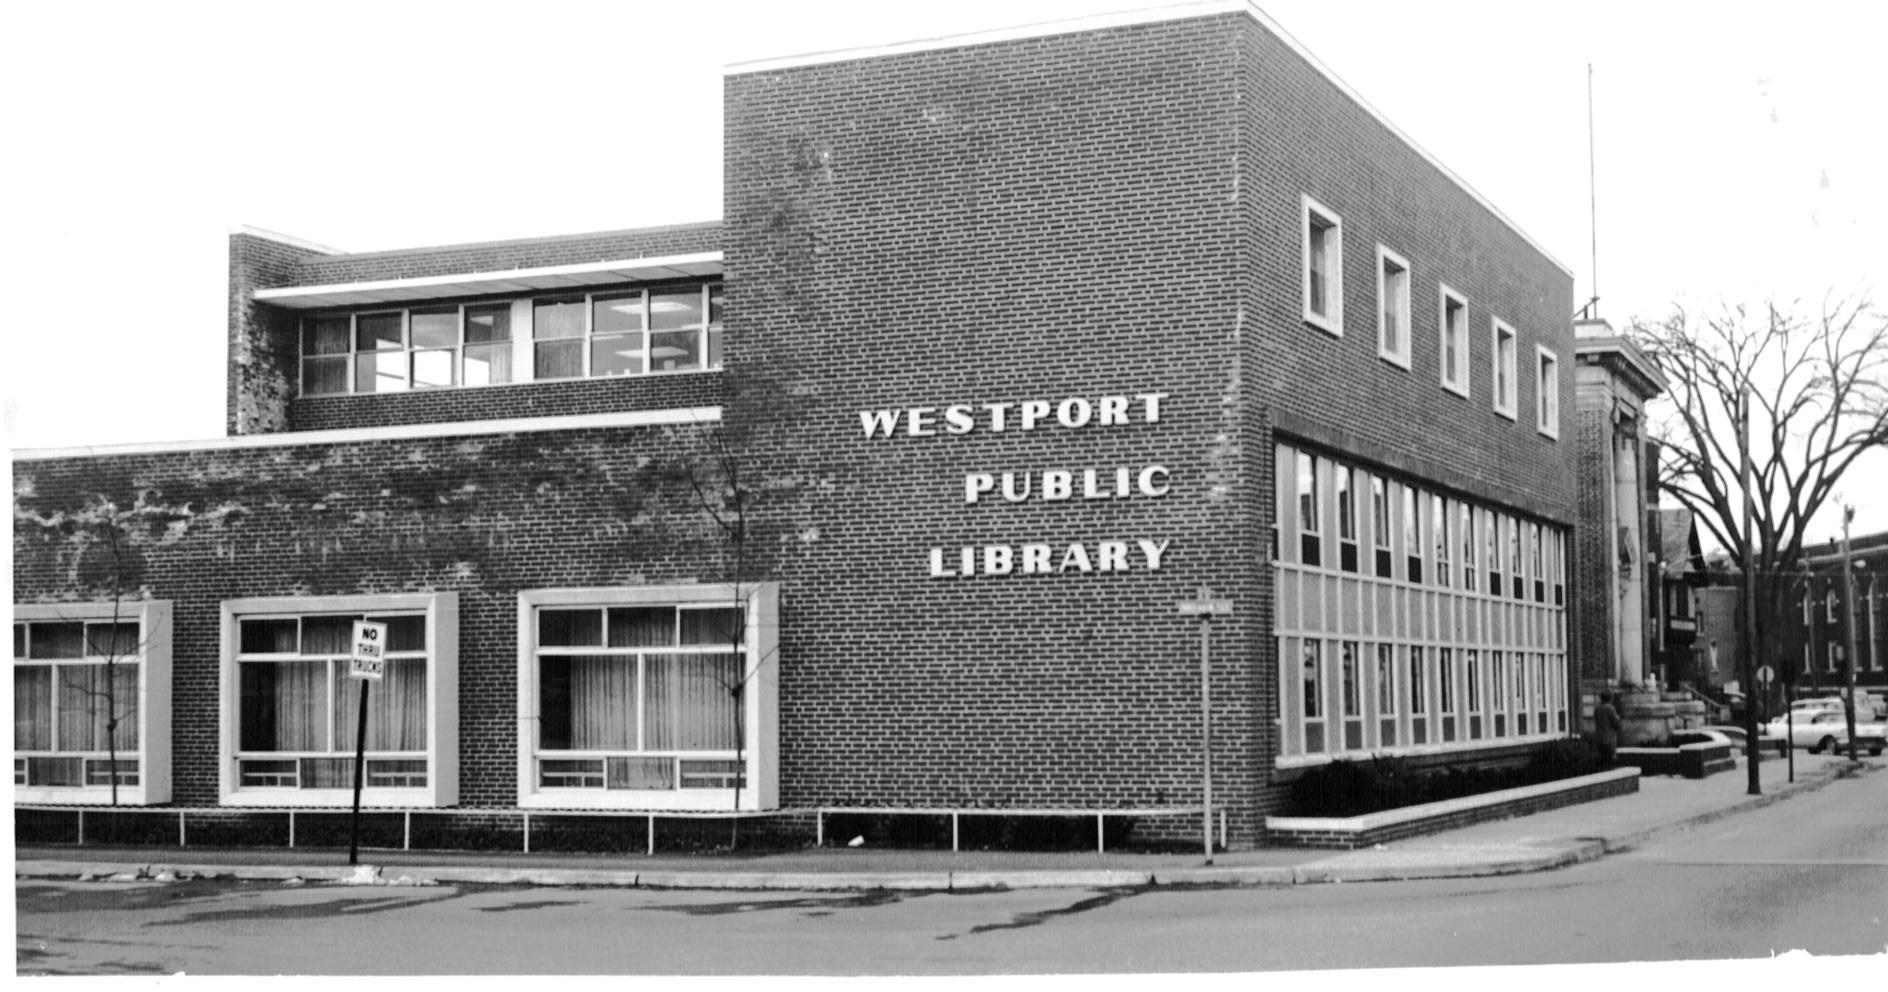 1950s-westport-public-library1.jpg